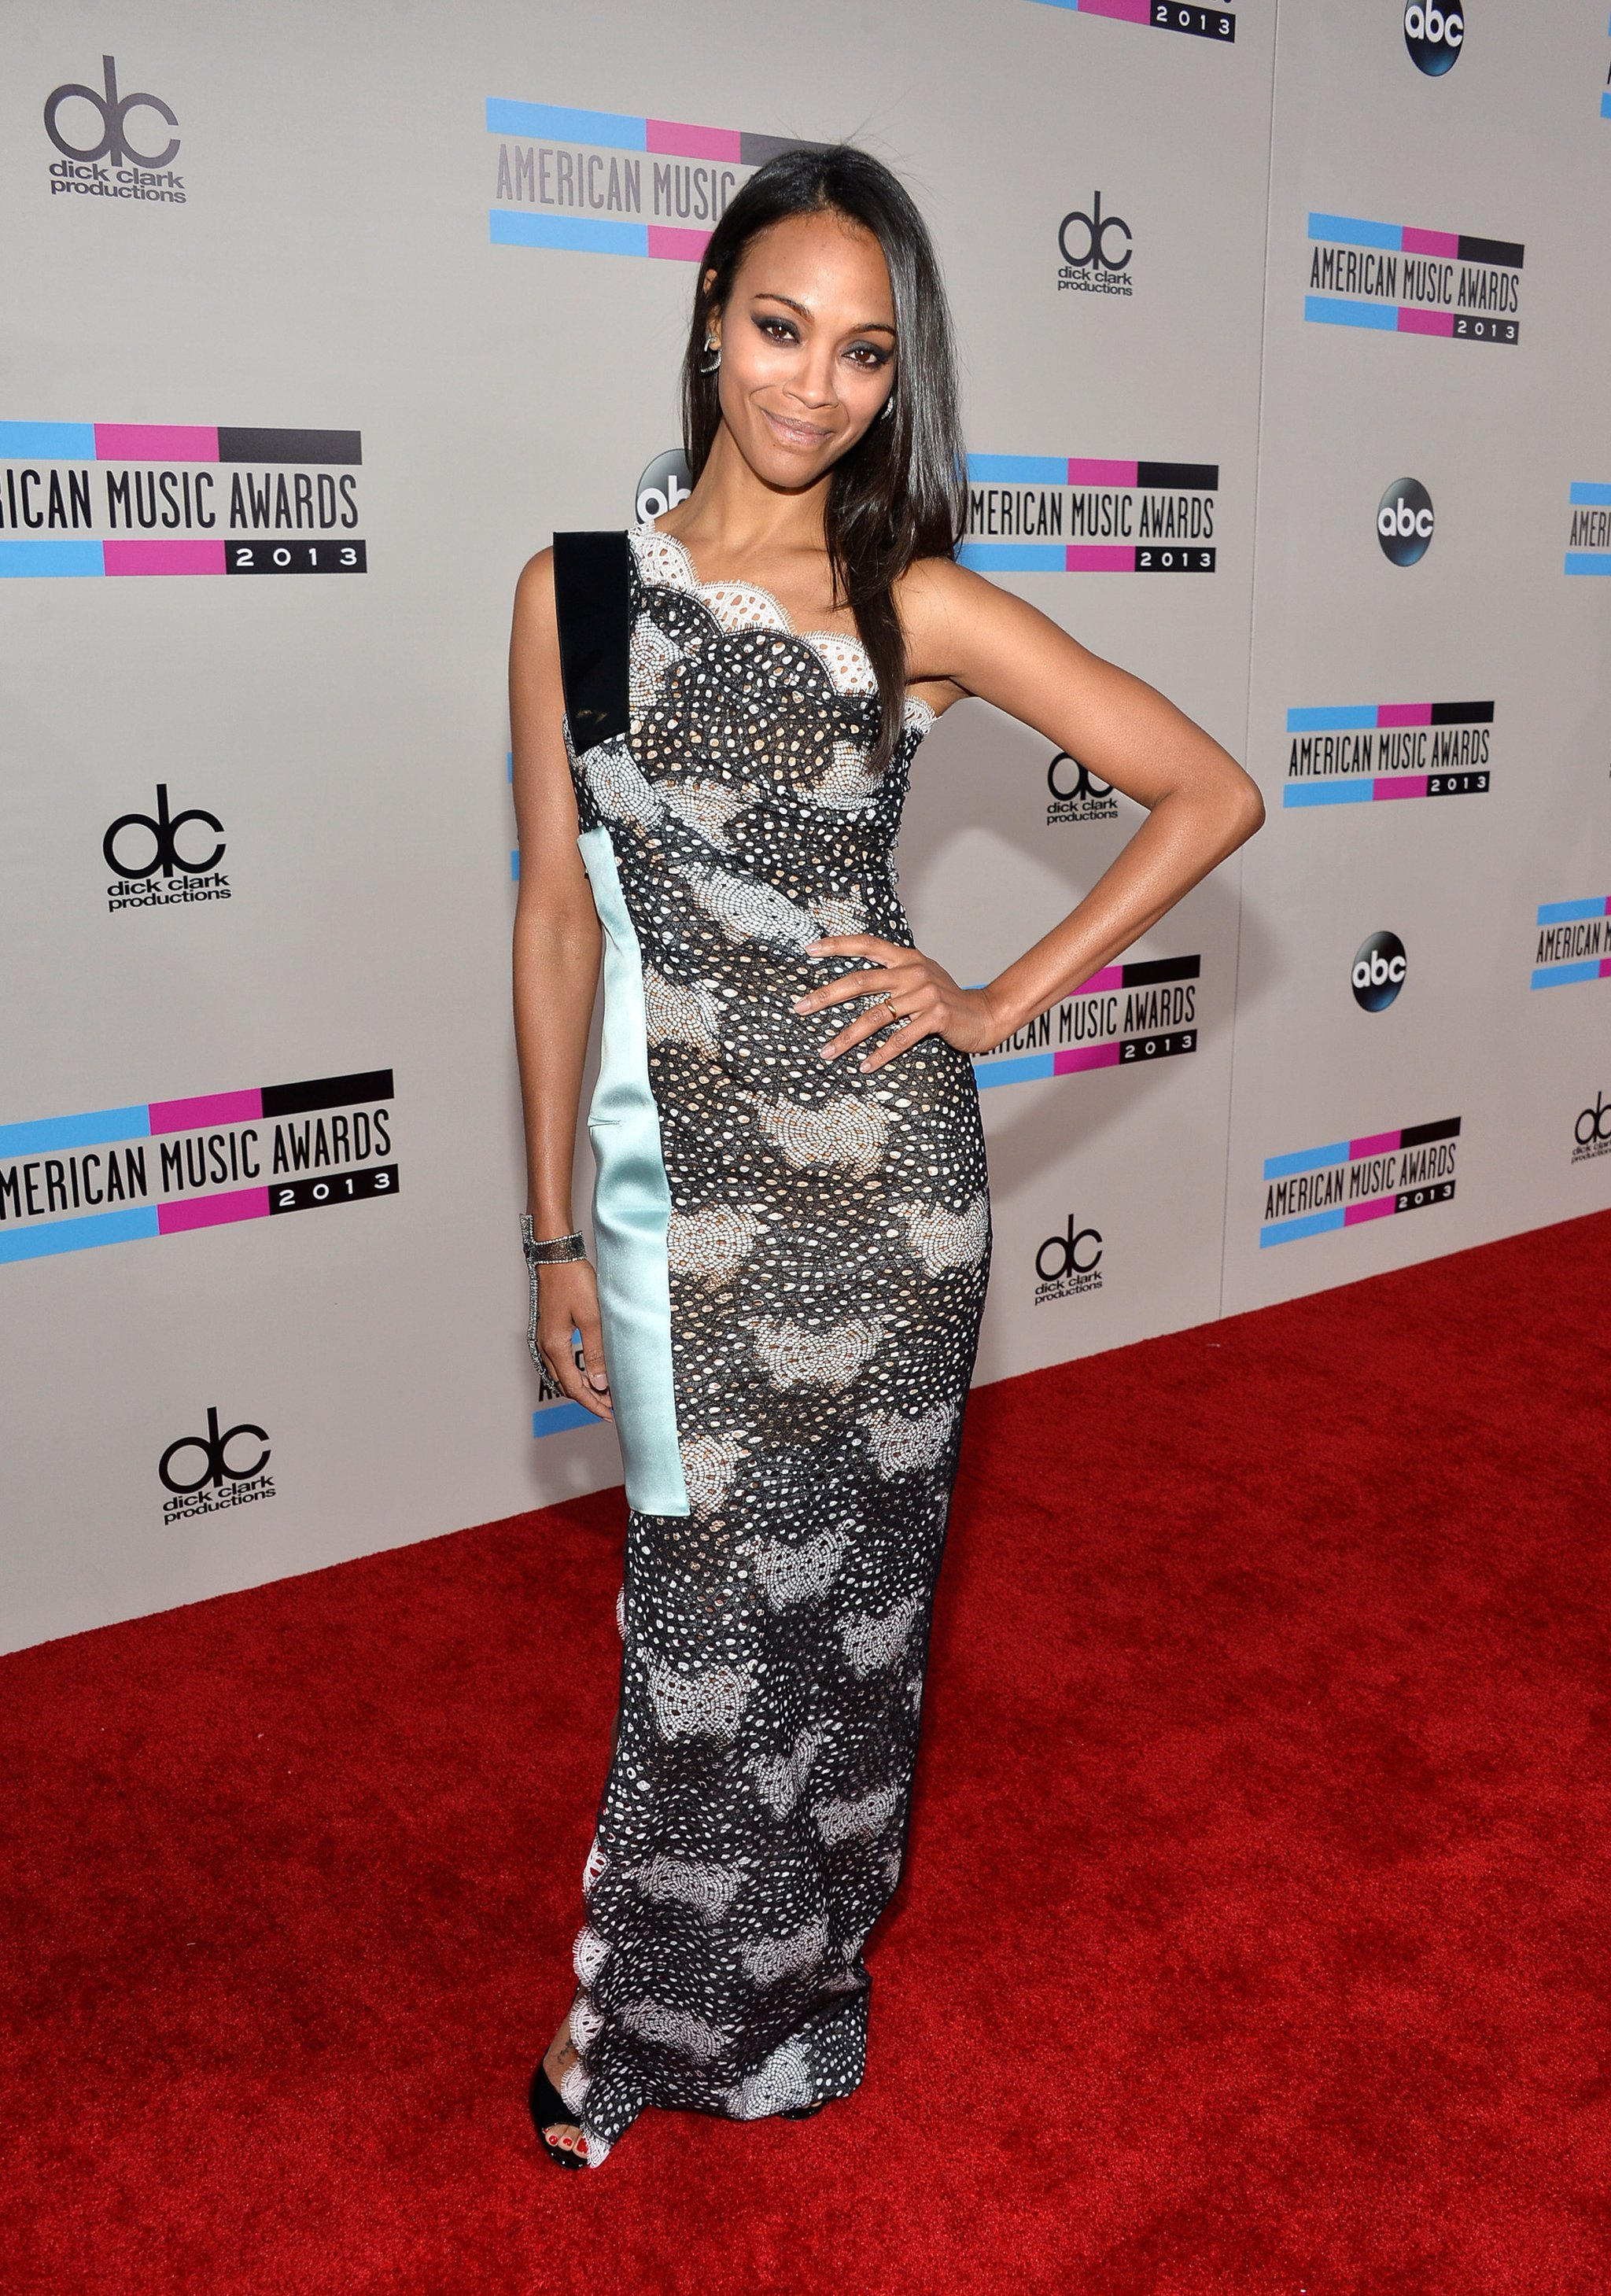 Zoe Saldana Style, Fashion Looks - StyleBistro 49